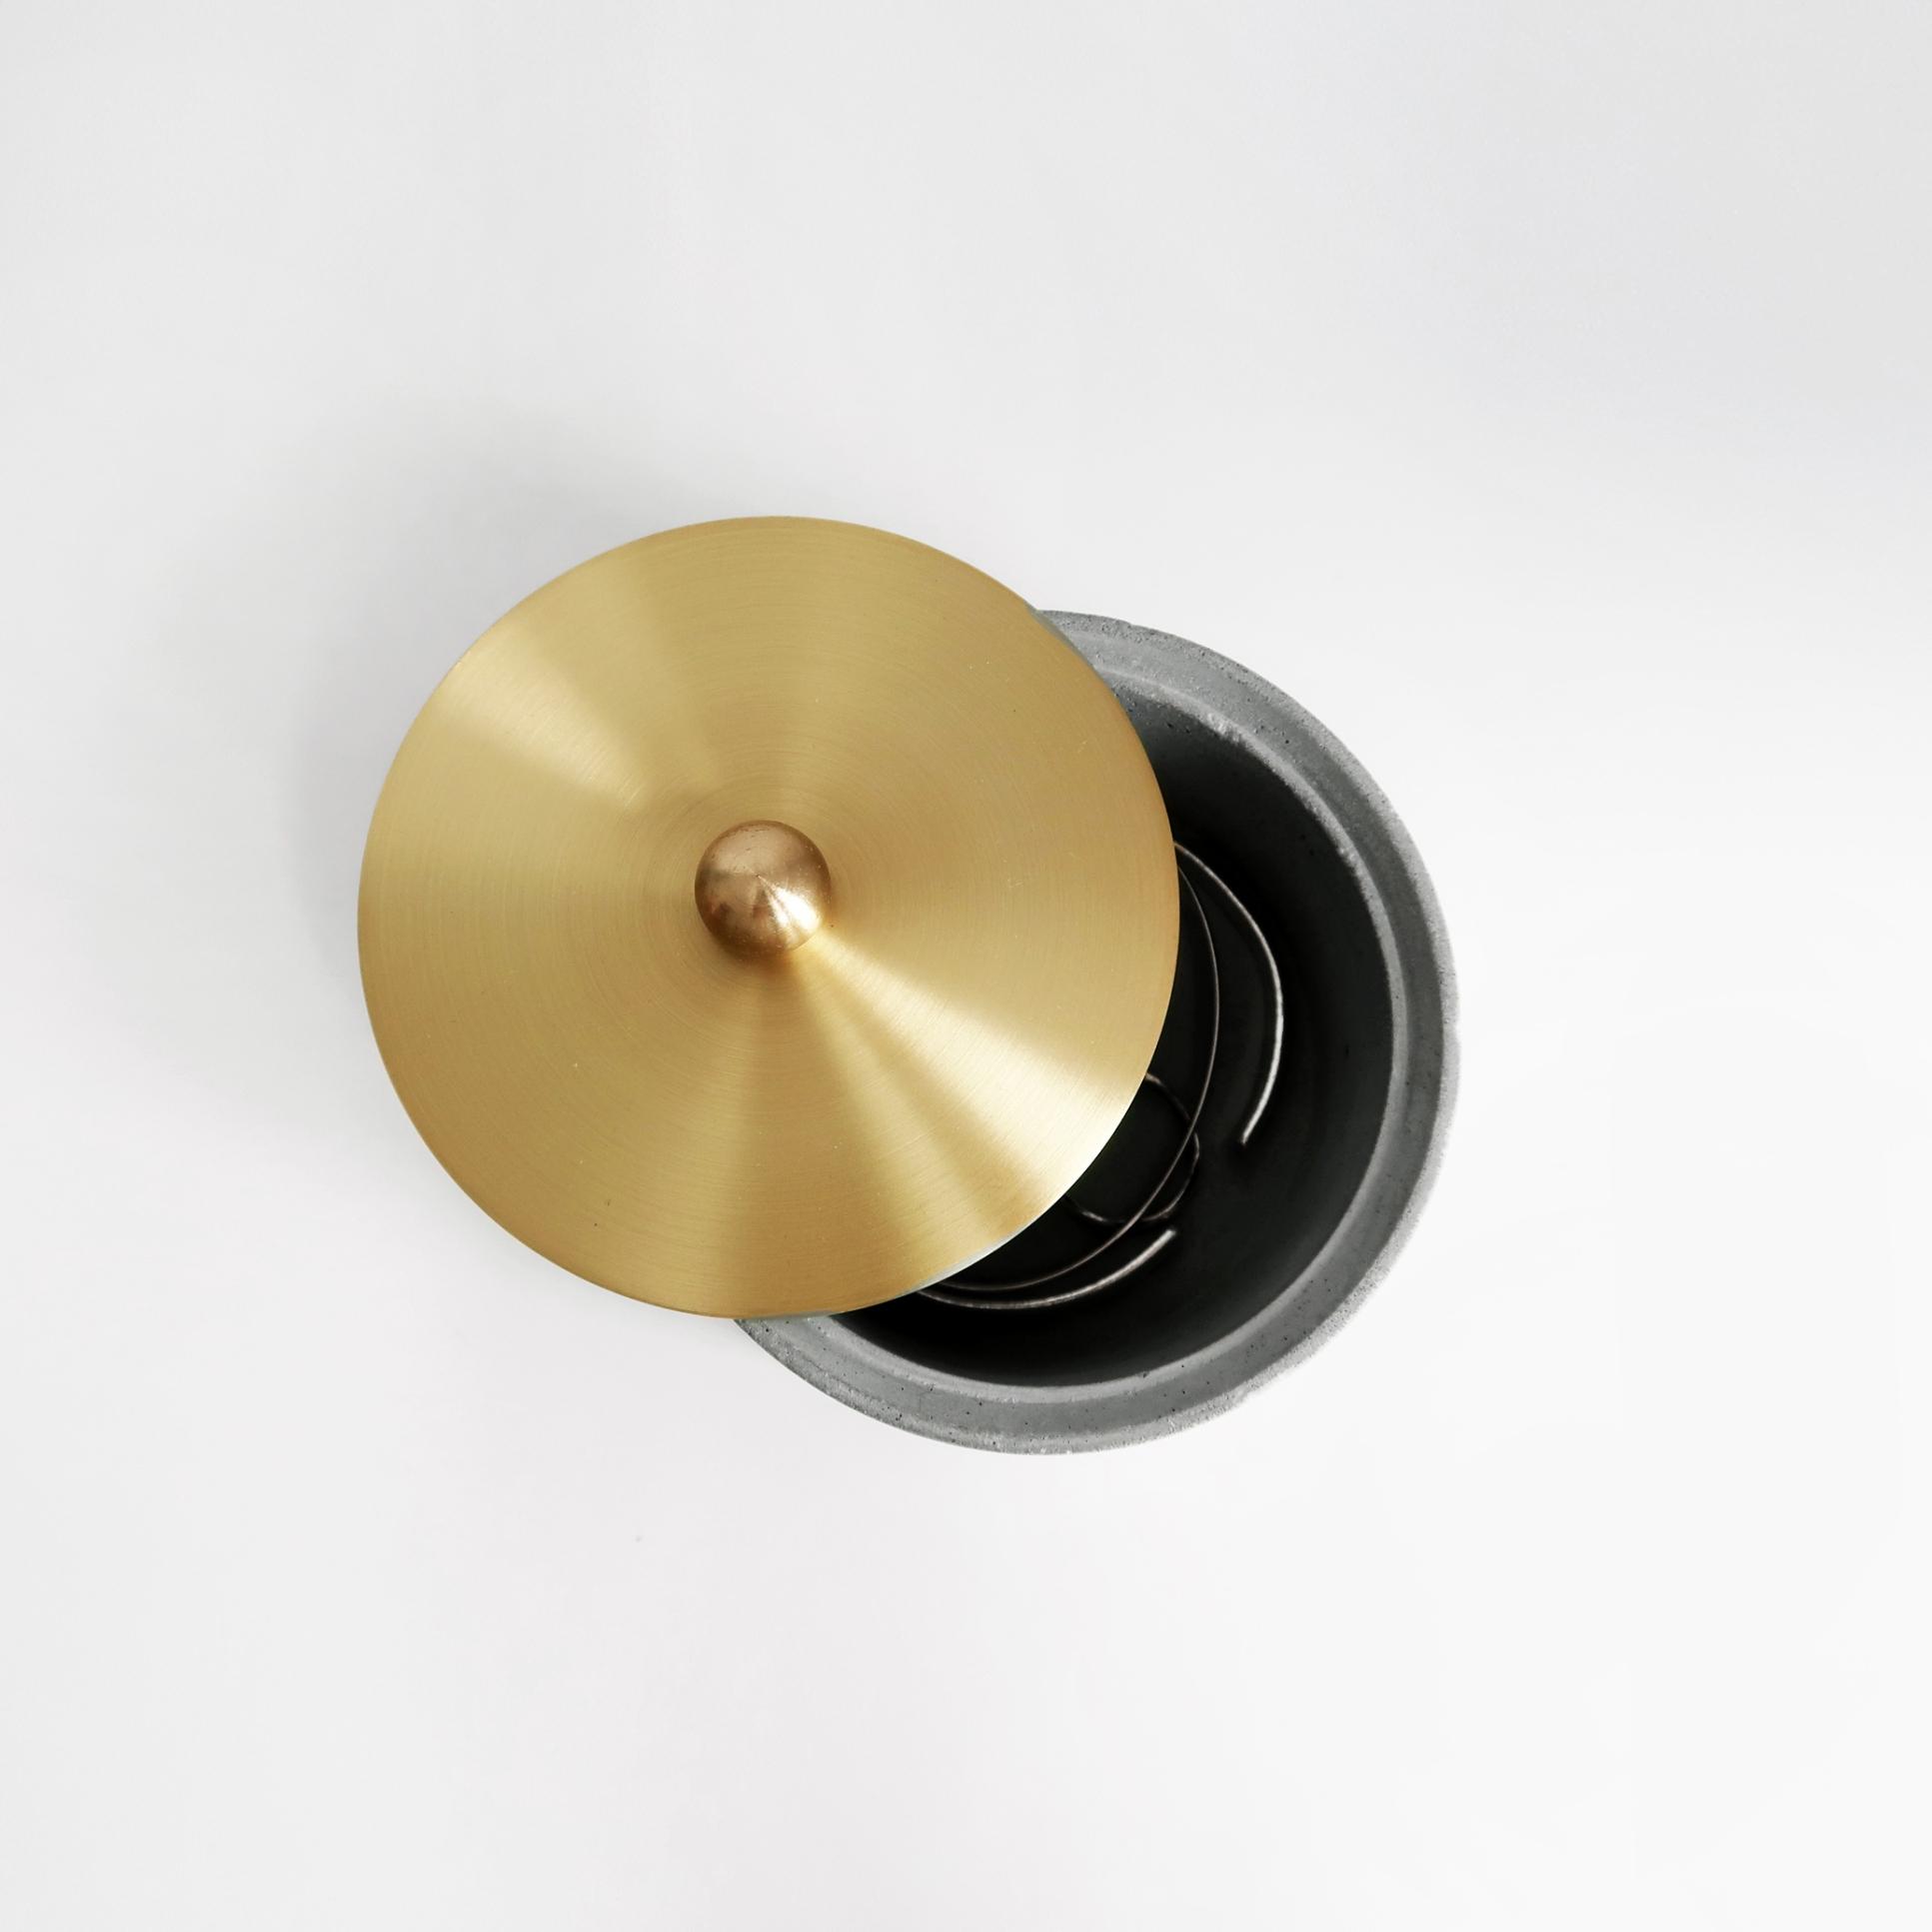 GLODEN MOON 懸月圓球黃銅蓋水泥收納容器・飾品盒・煙灰缸